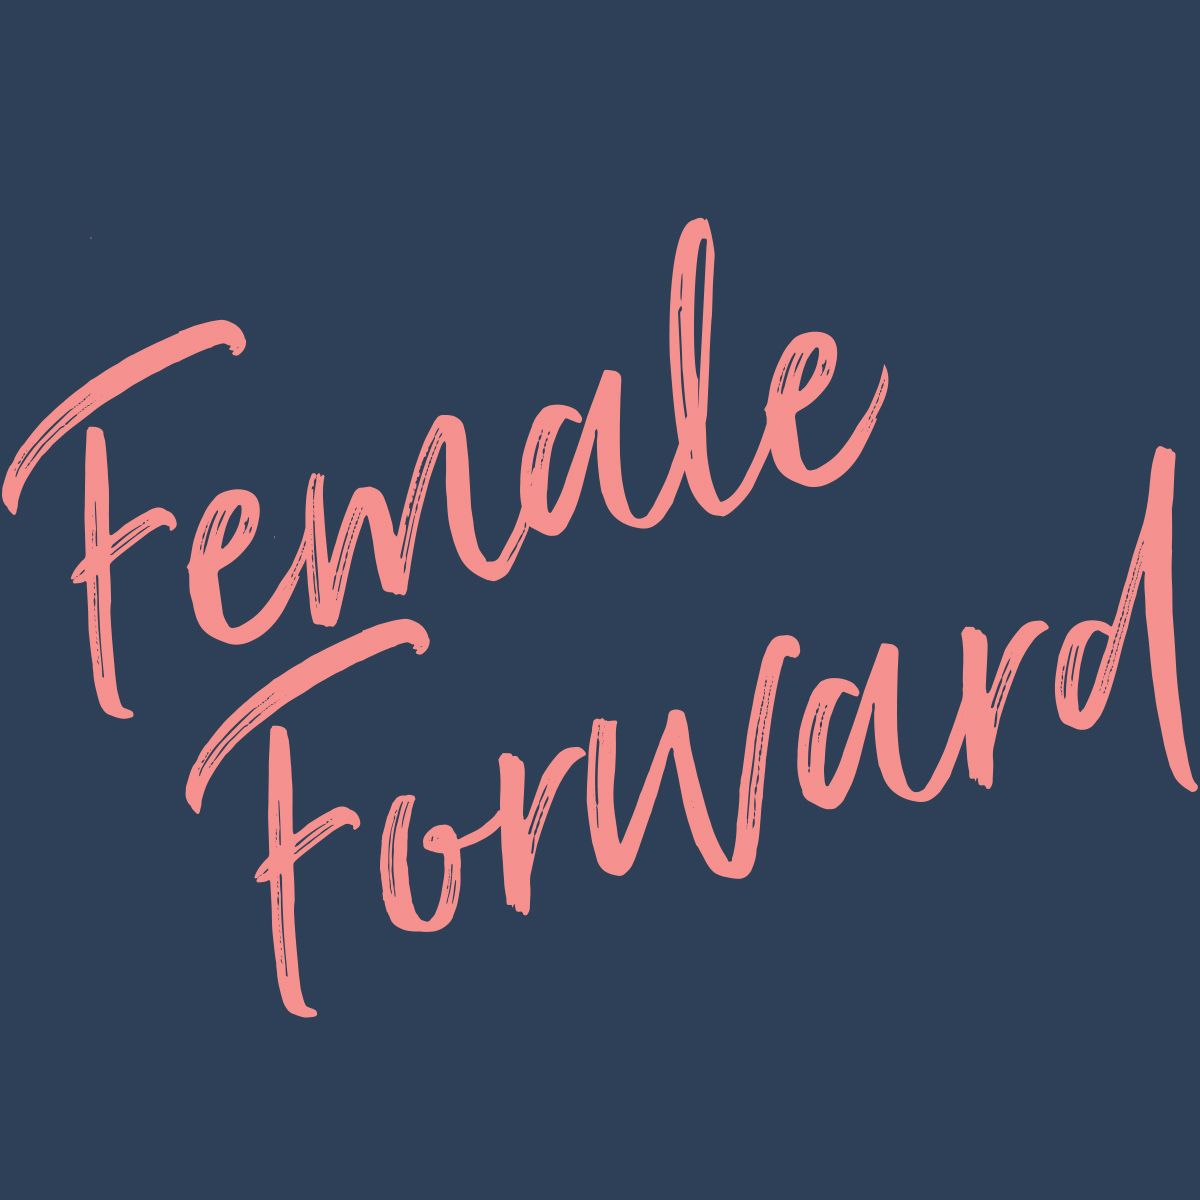 FemaleForword02.jpg